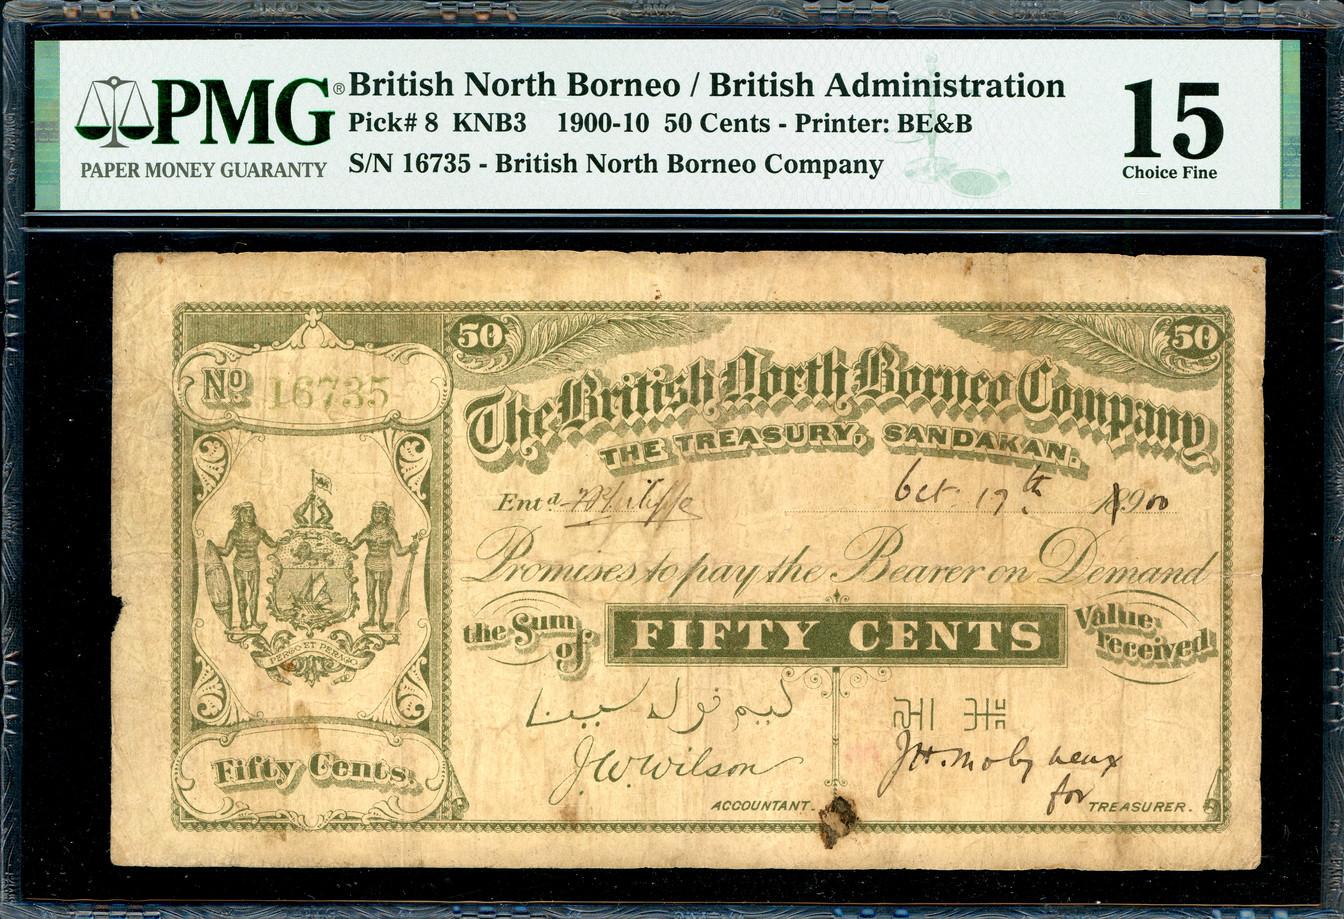 British North Borneo, 50 Cents, 1900-10, PMG 15